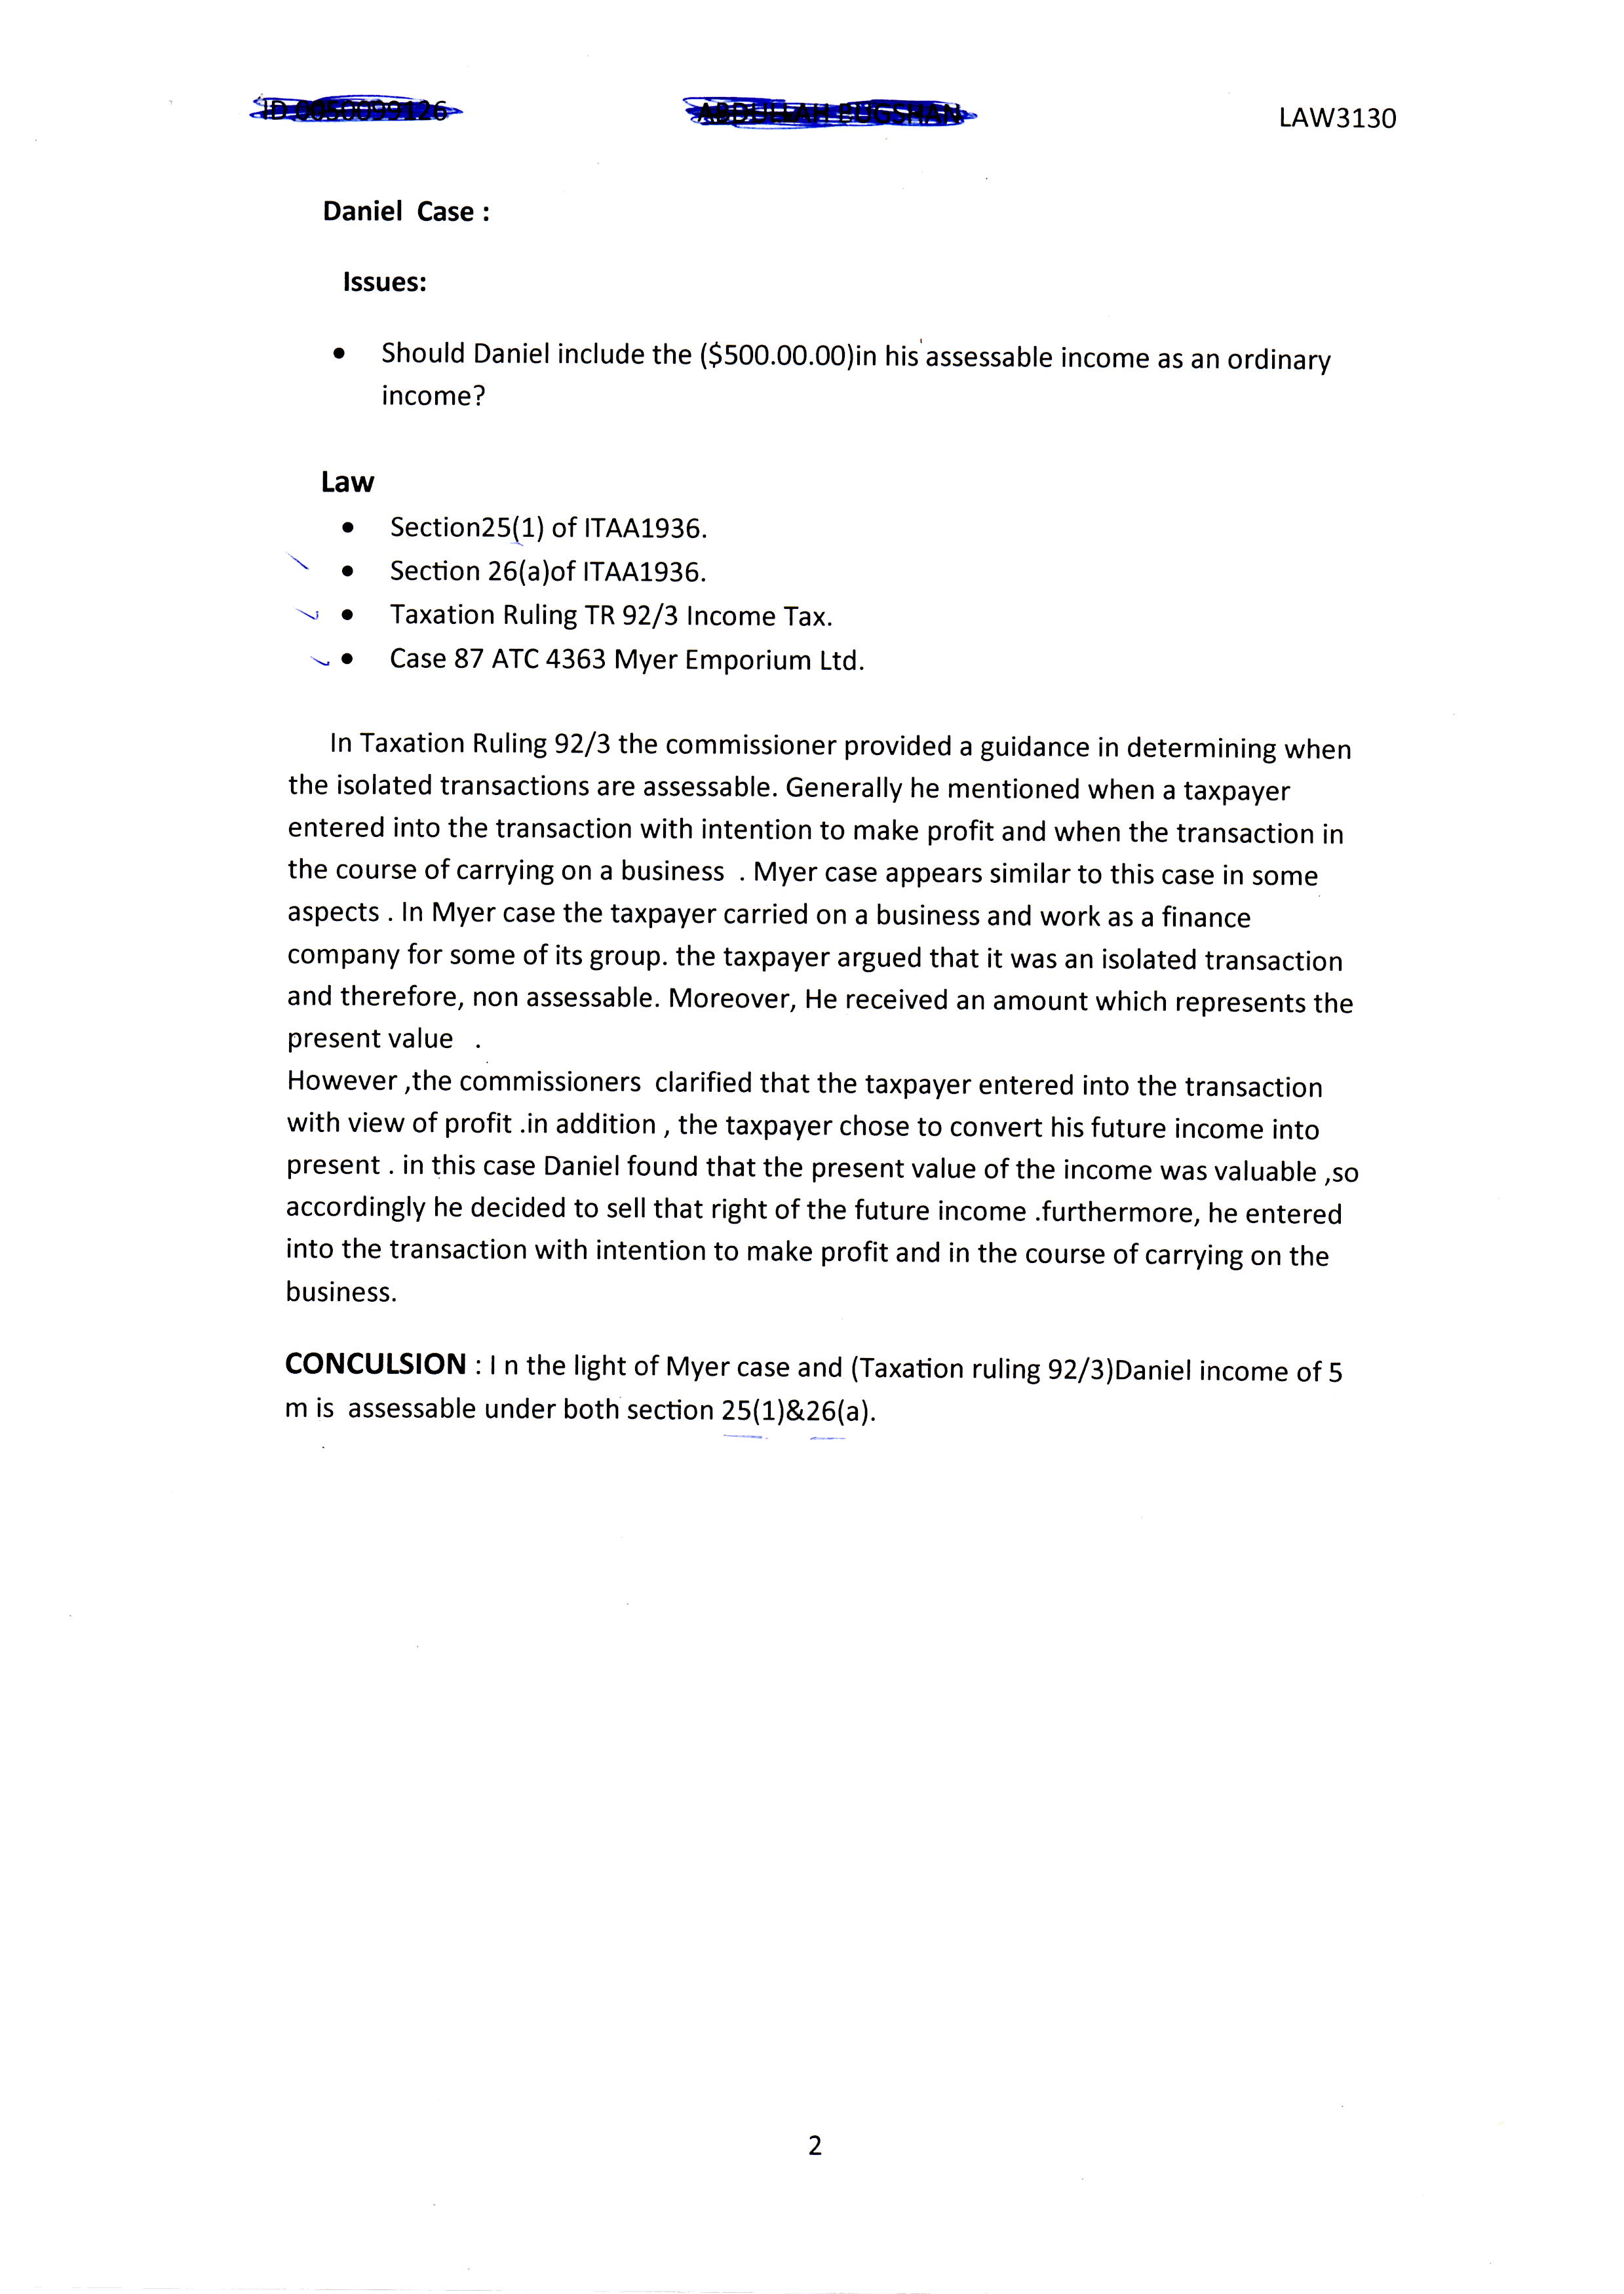 taxation law case study myer s International businesstaxation  astudyintheinternationalization  ofbusinessregulation  solpicciotto  emeritusprofessor,universityoflancaster.